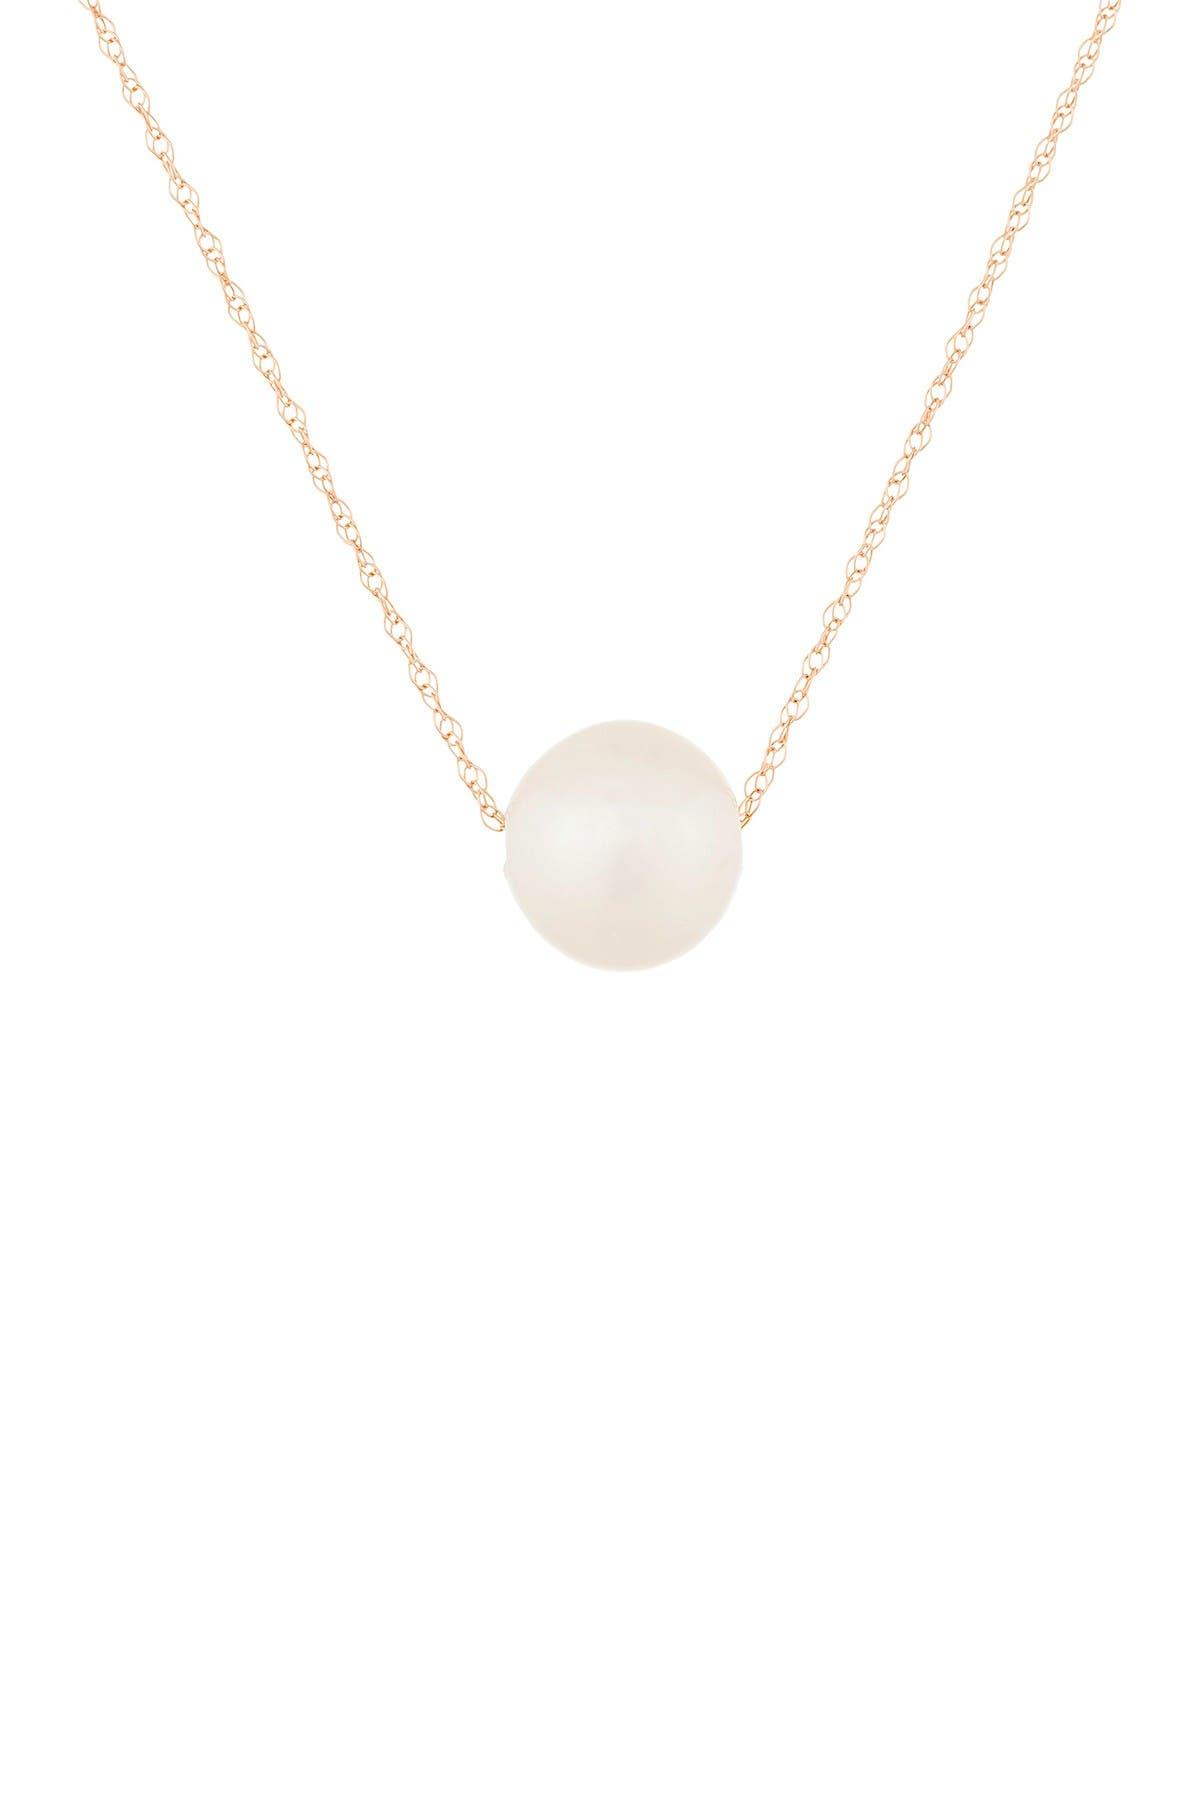 Splendid Pearls 14K Rose Gold 10-11mm Freshwater Pearl Pendant Necklace at Nordstrom Rack